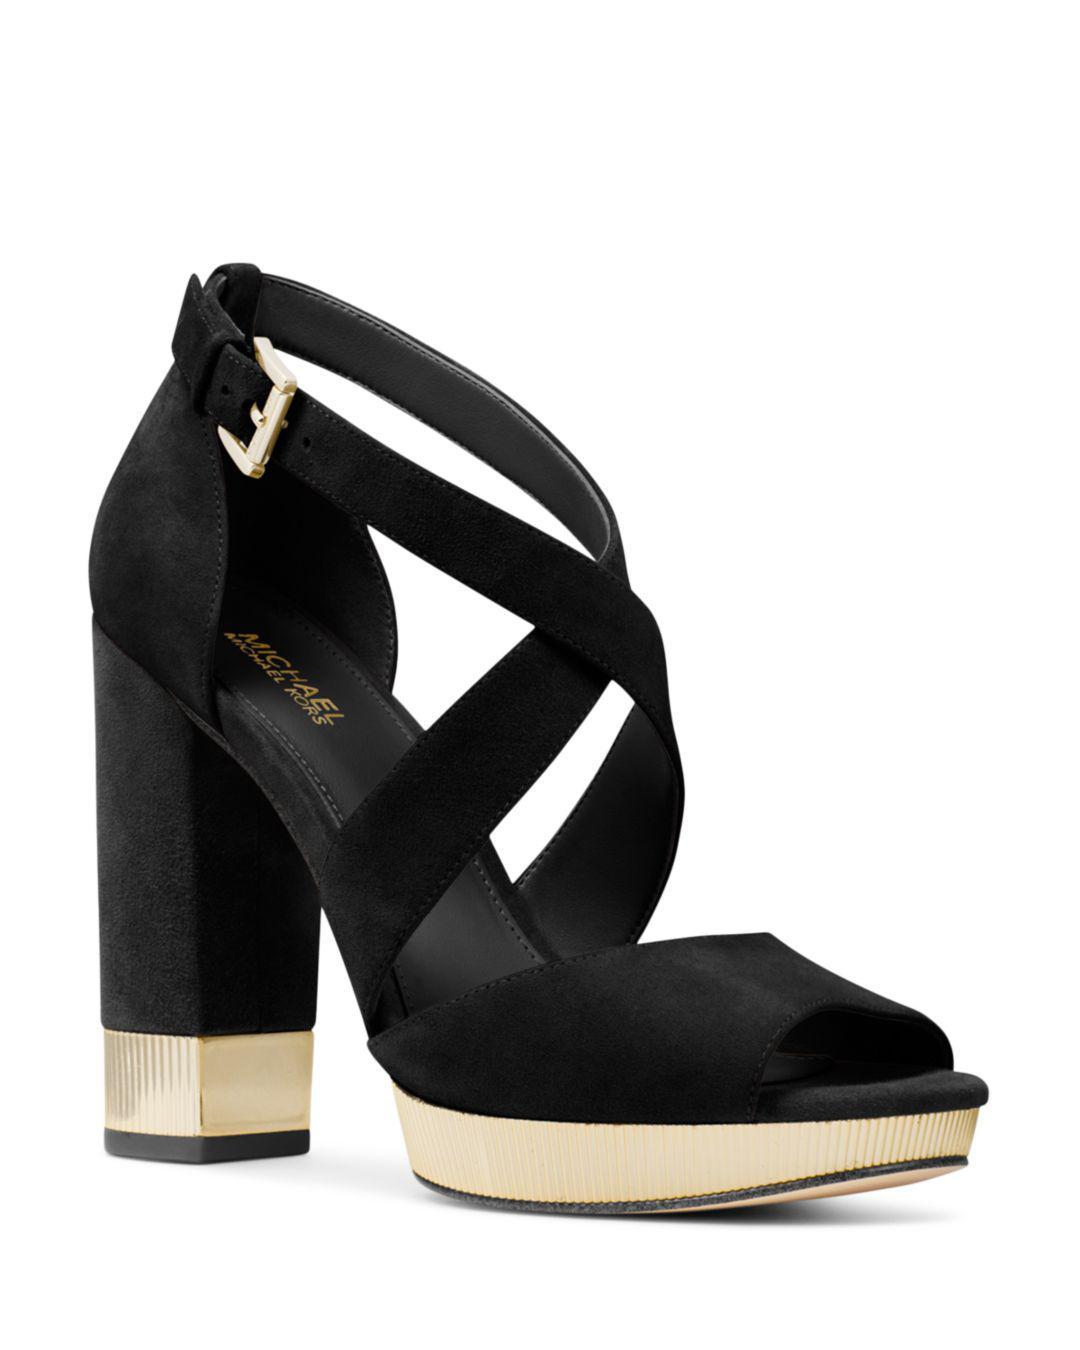 e499e9ce8f21 Lyst - Michael Kors Valerie Suede Platform Sandal in Black - Save 14%